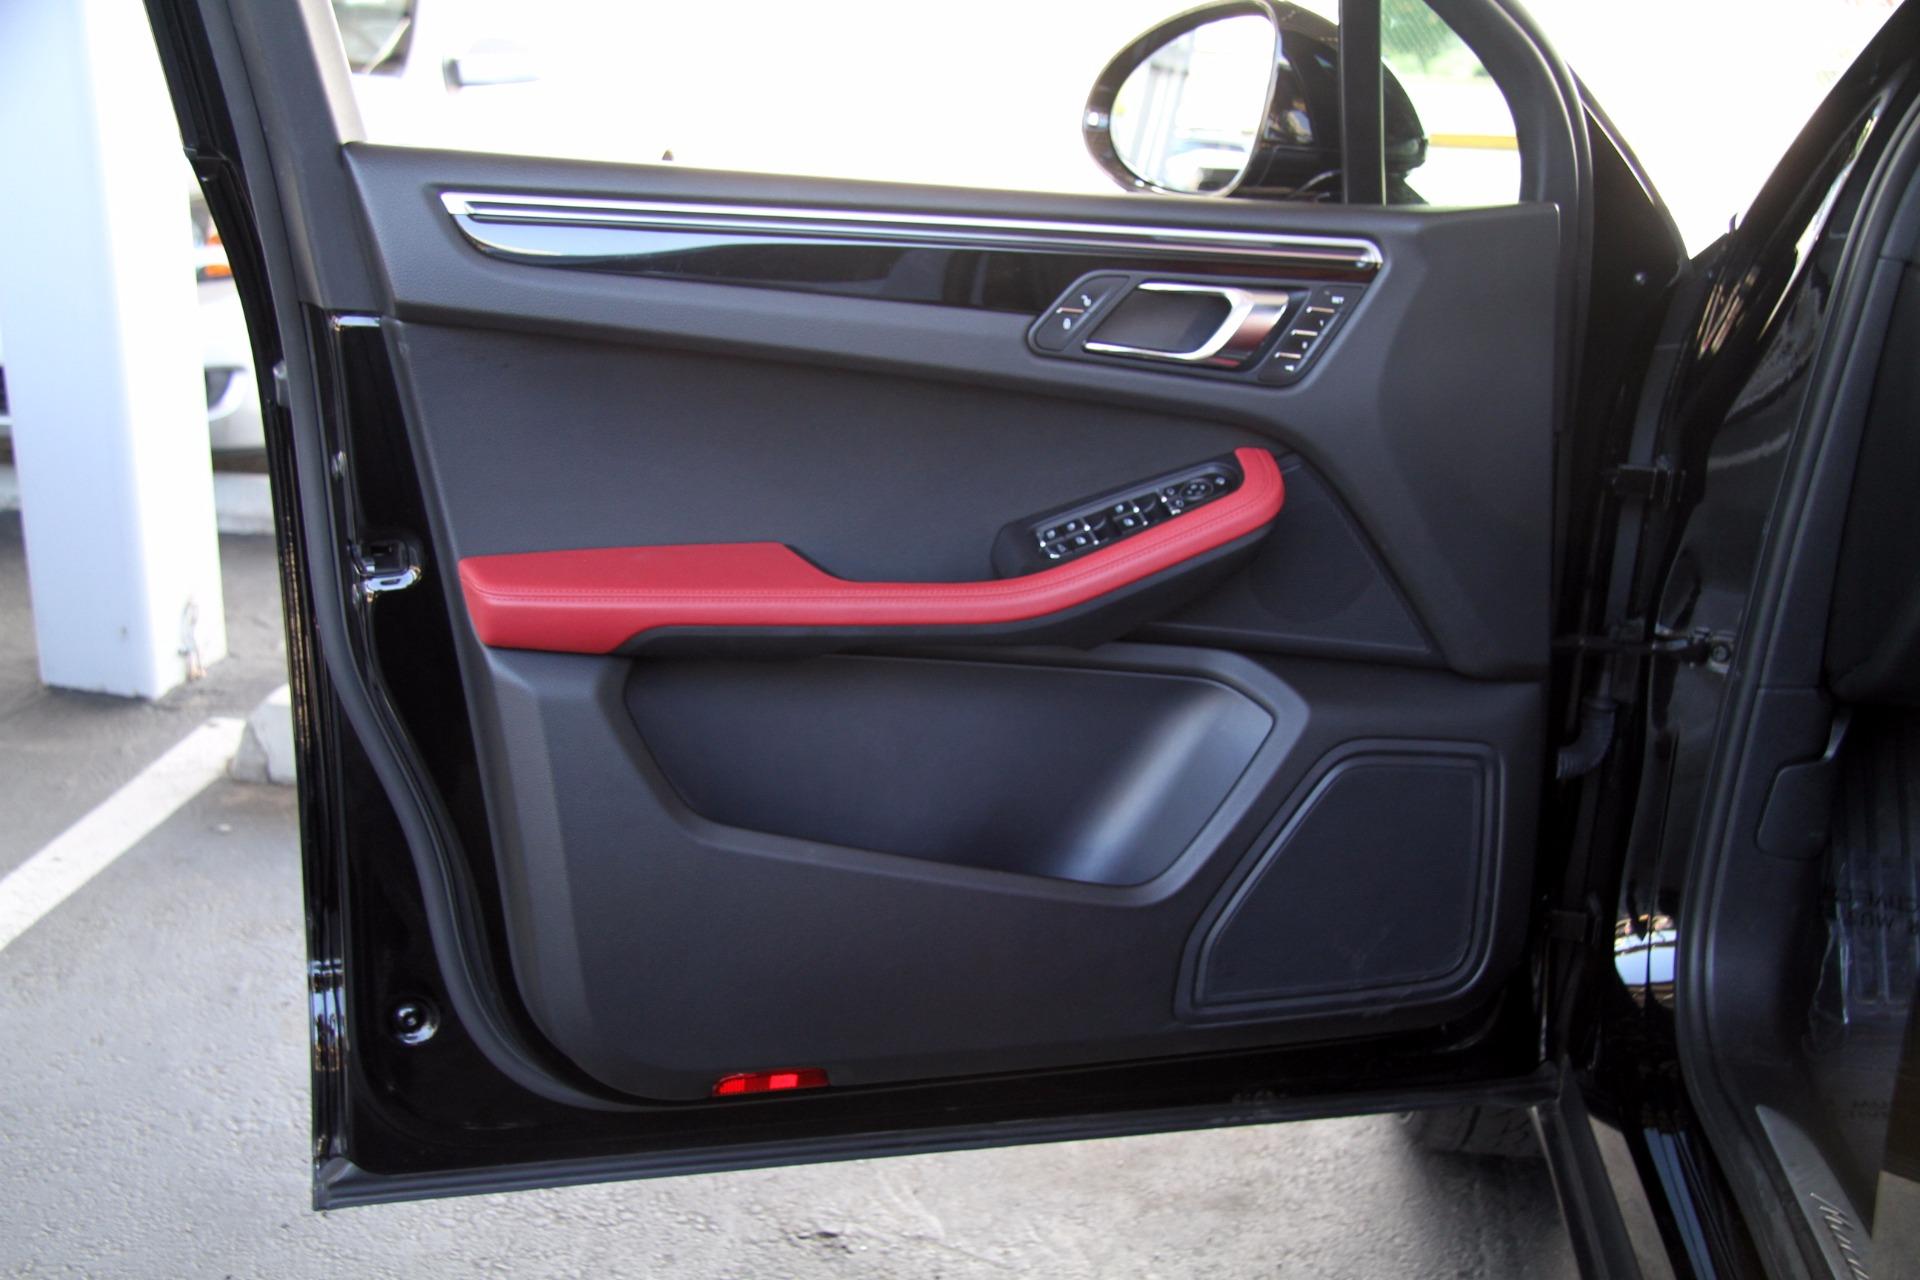 chosencars dealers r me of jaguar in new cincinnati sedan best xj sport awesome door near dealership